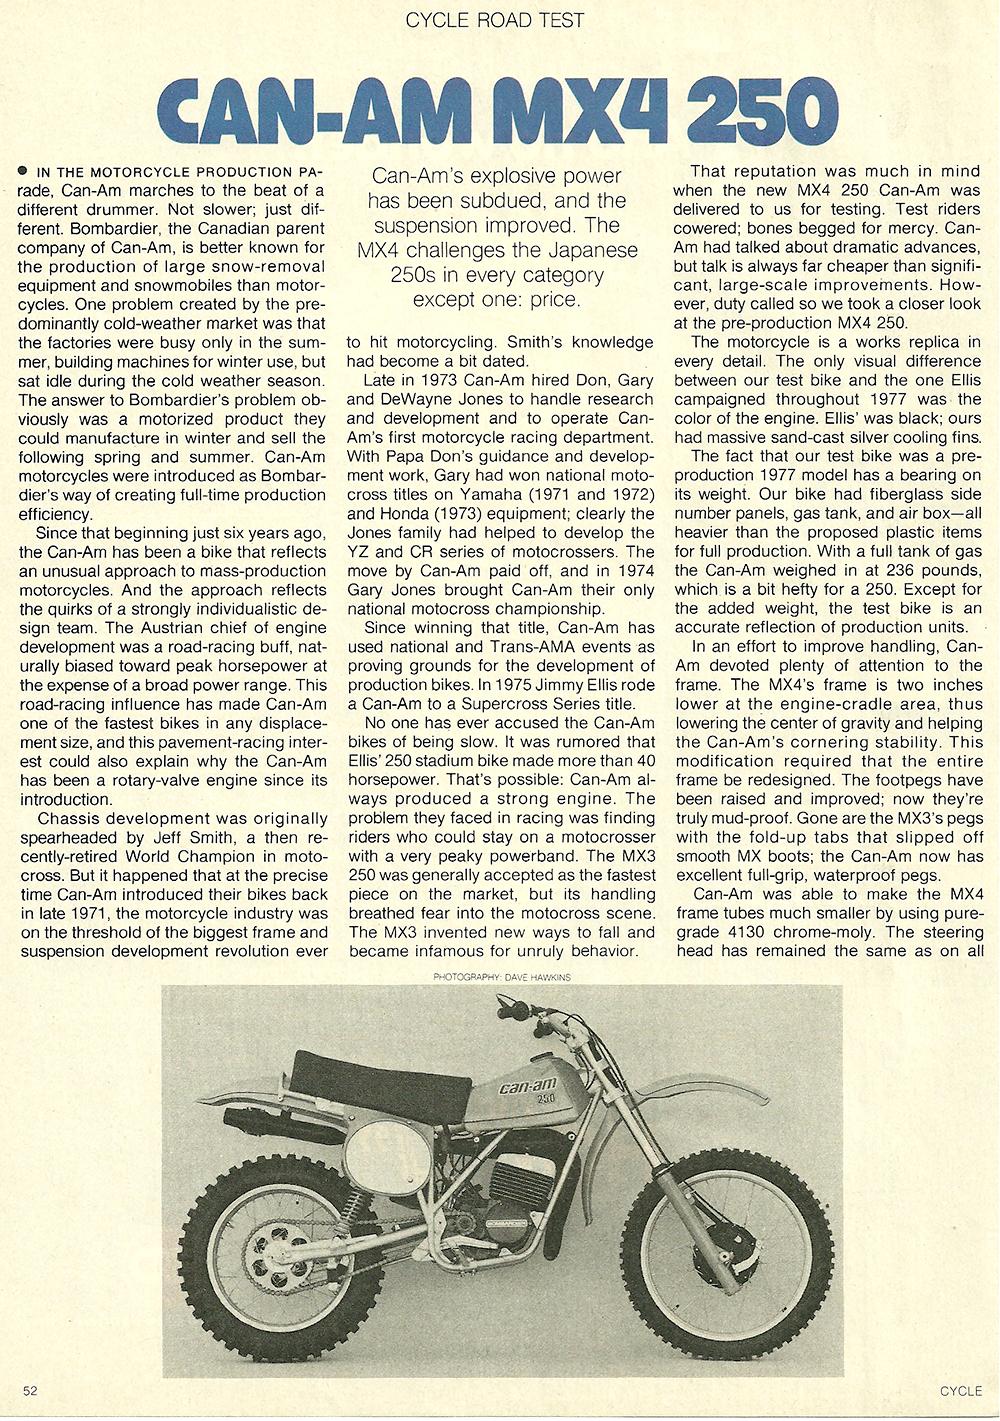 1978 Can-Am MX4 250 road test 1.jpg